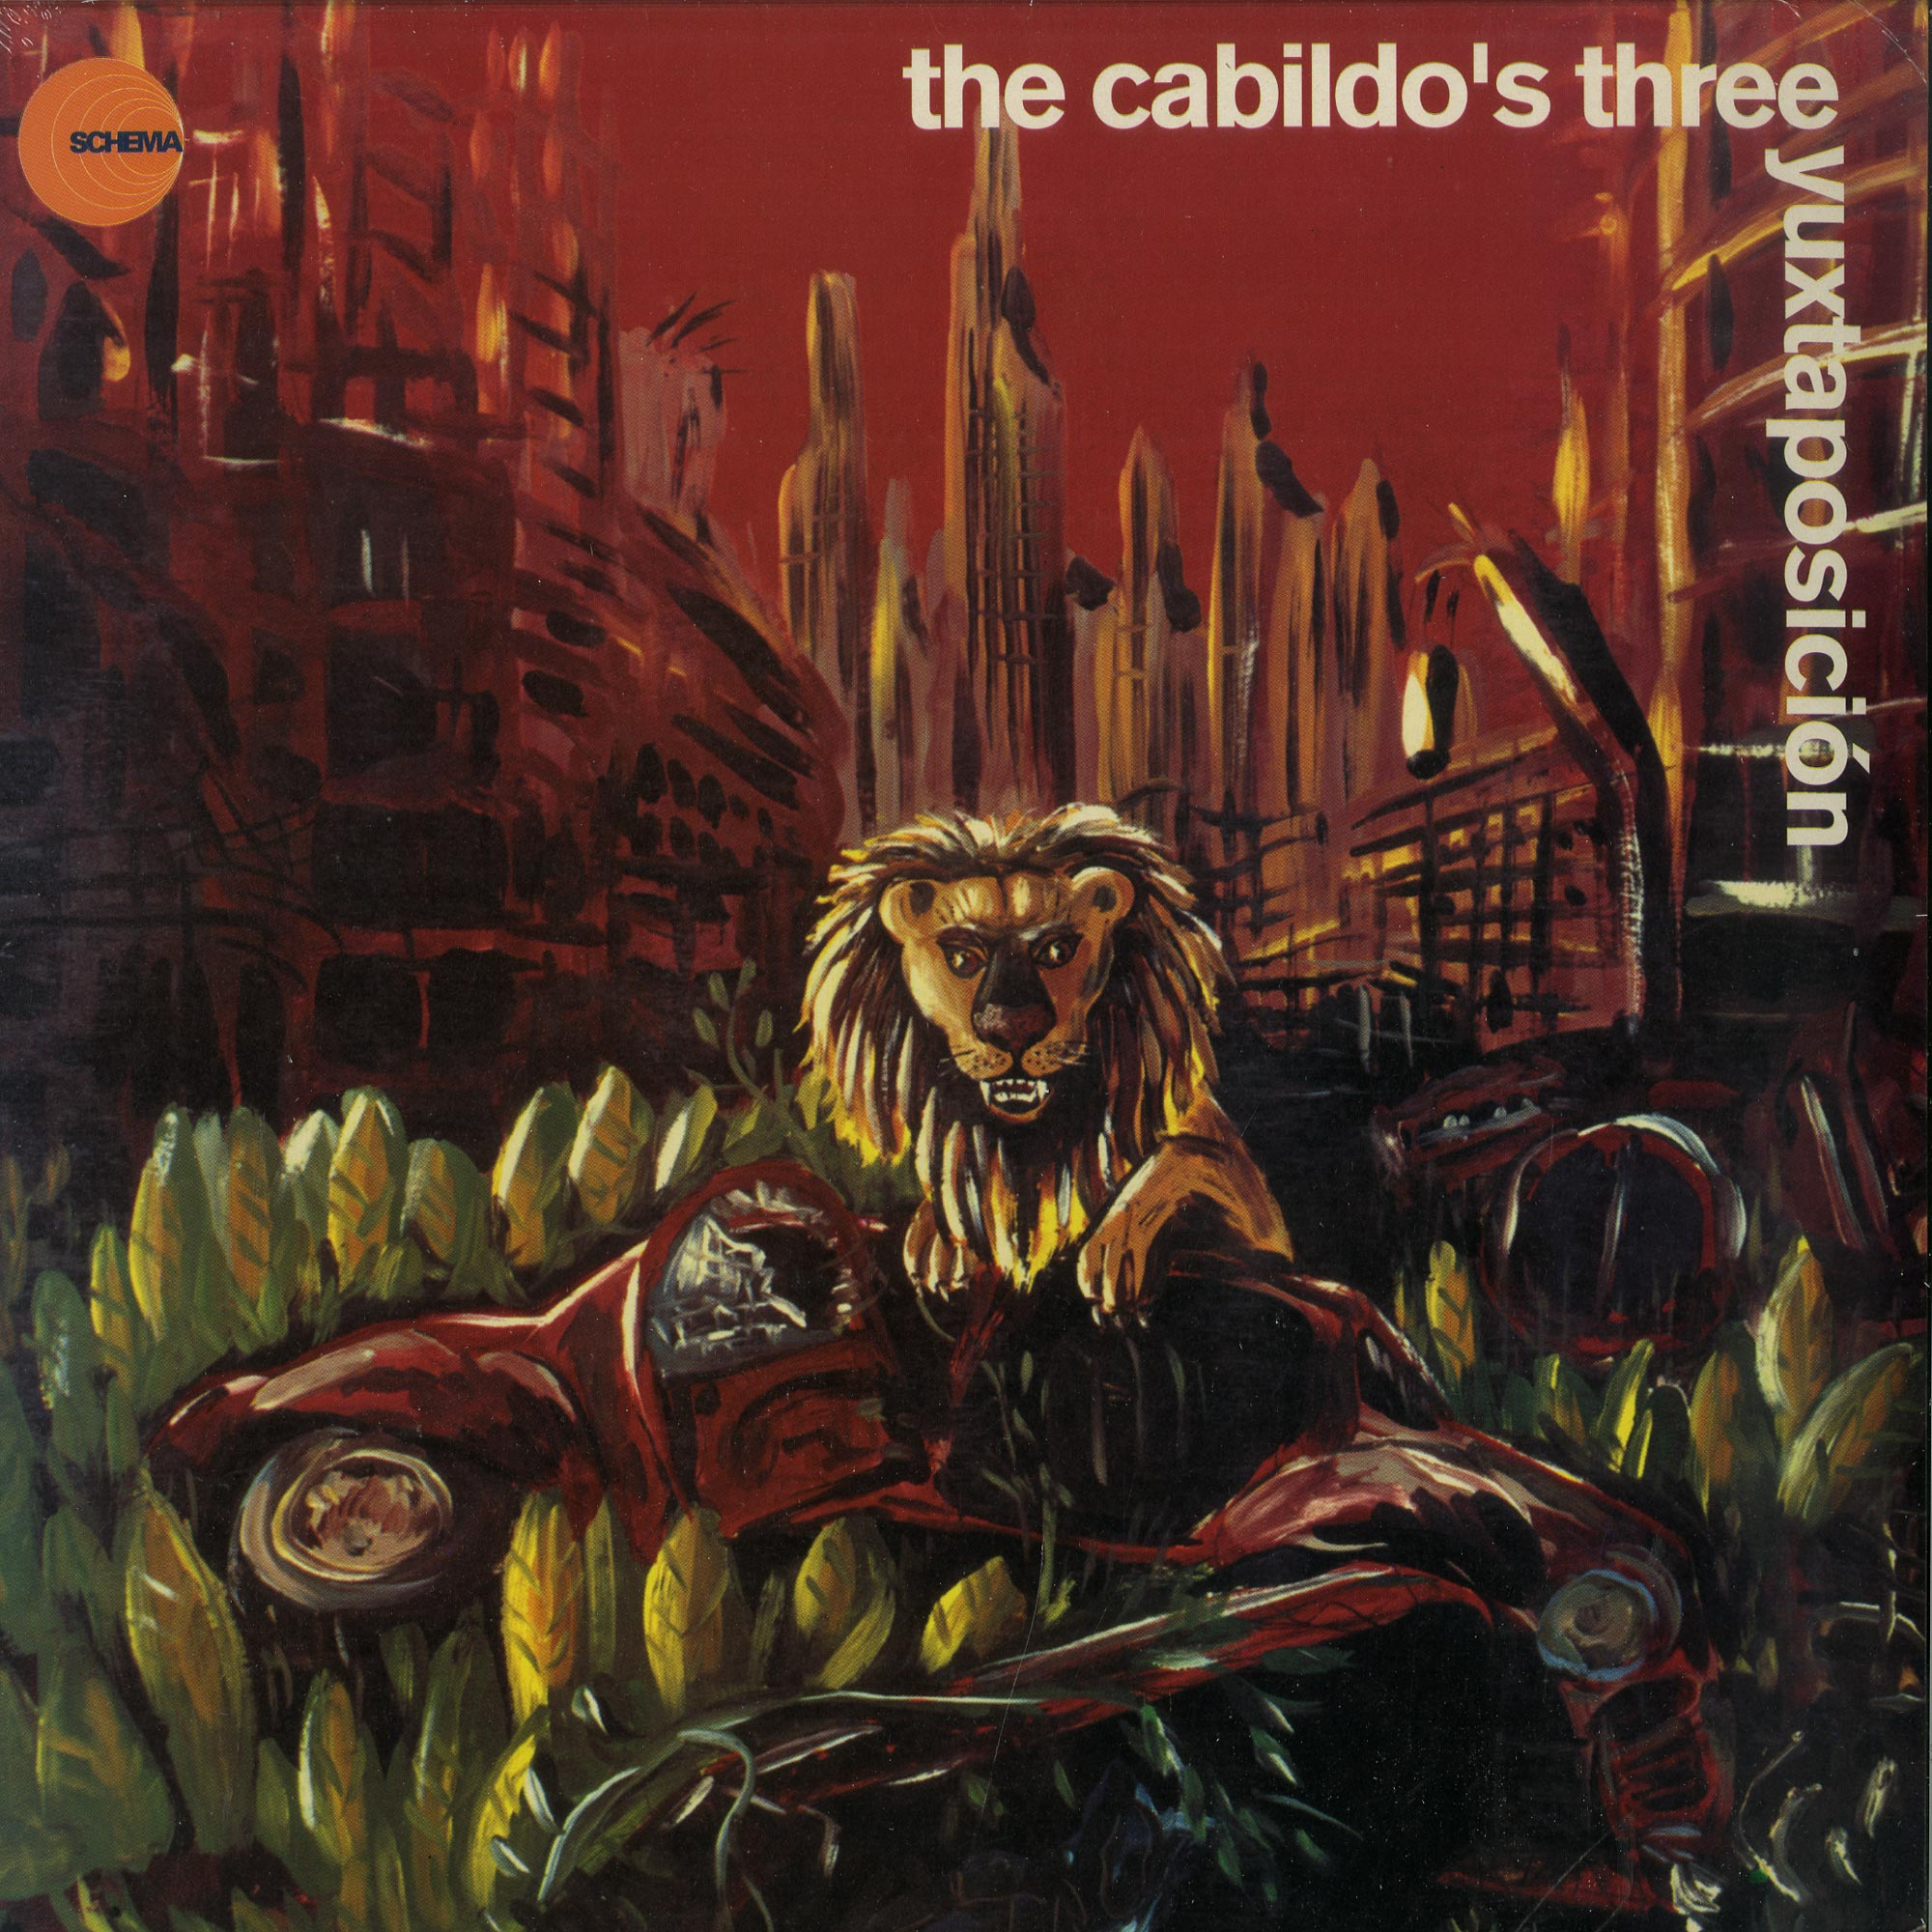 The Cabildos Three - YUXTAPOSICION